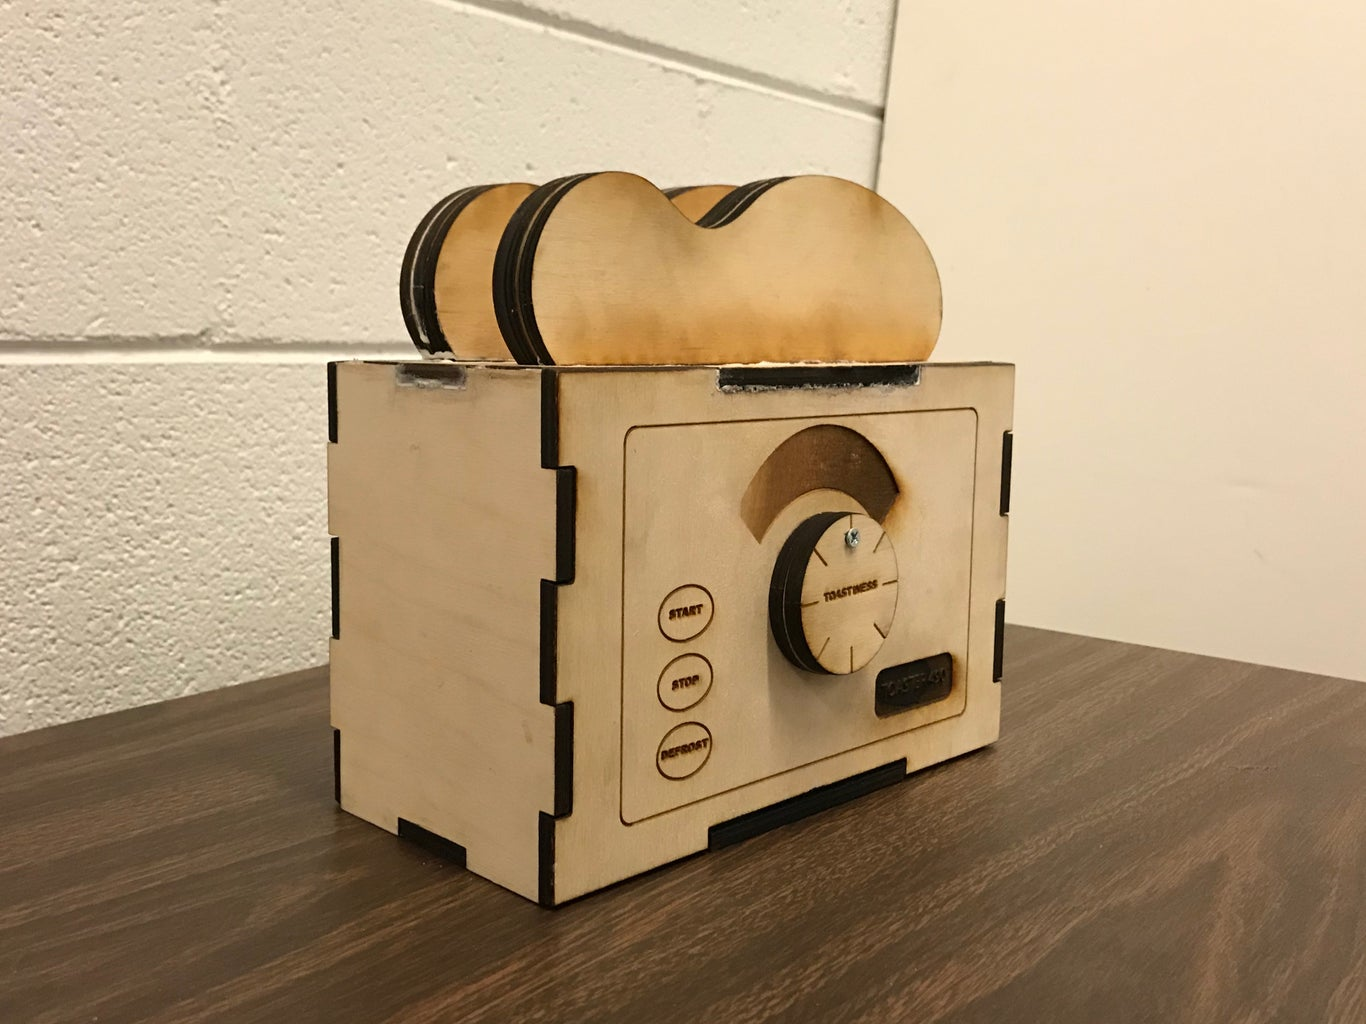 How to Make a Toaster Pinhole Camera